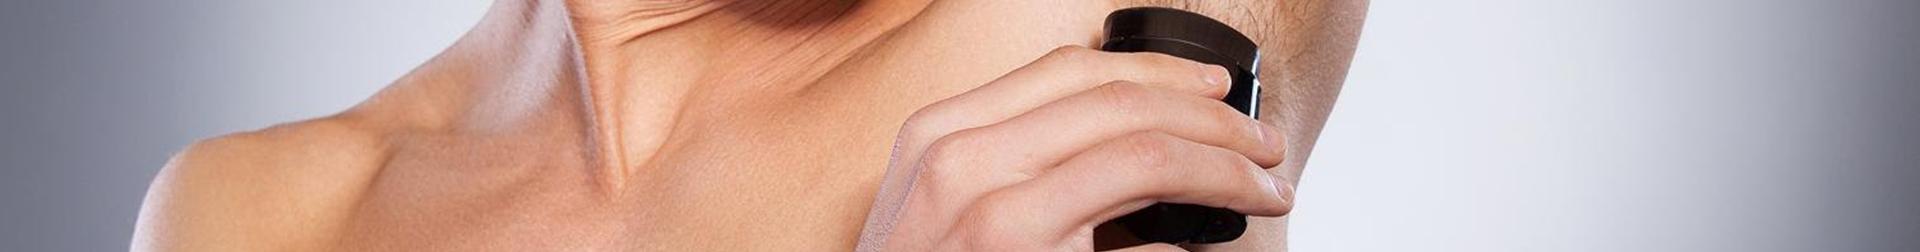 Deodorant Roll-ons | Buy Best Deodorant Roll-ons For Unisex | Aromacraze.com